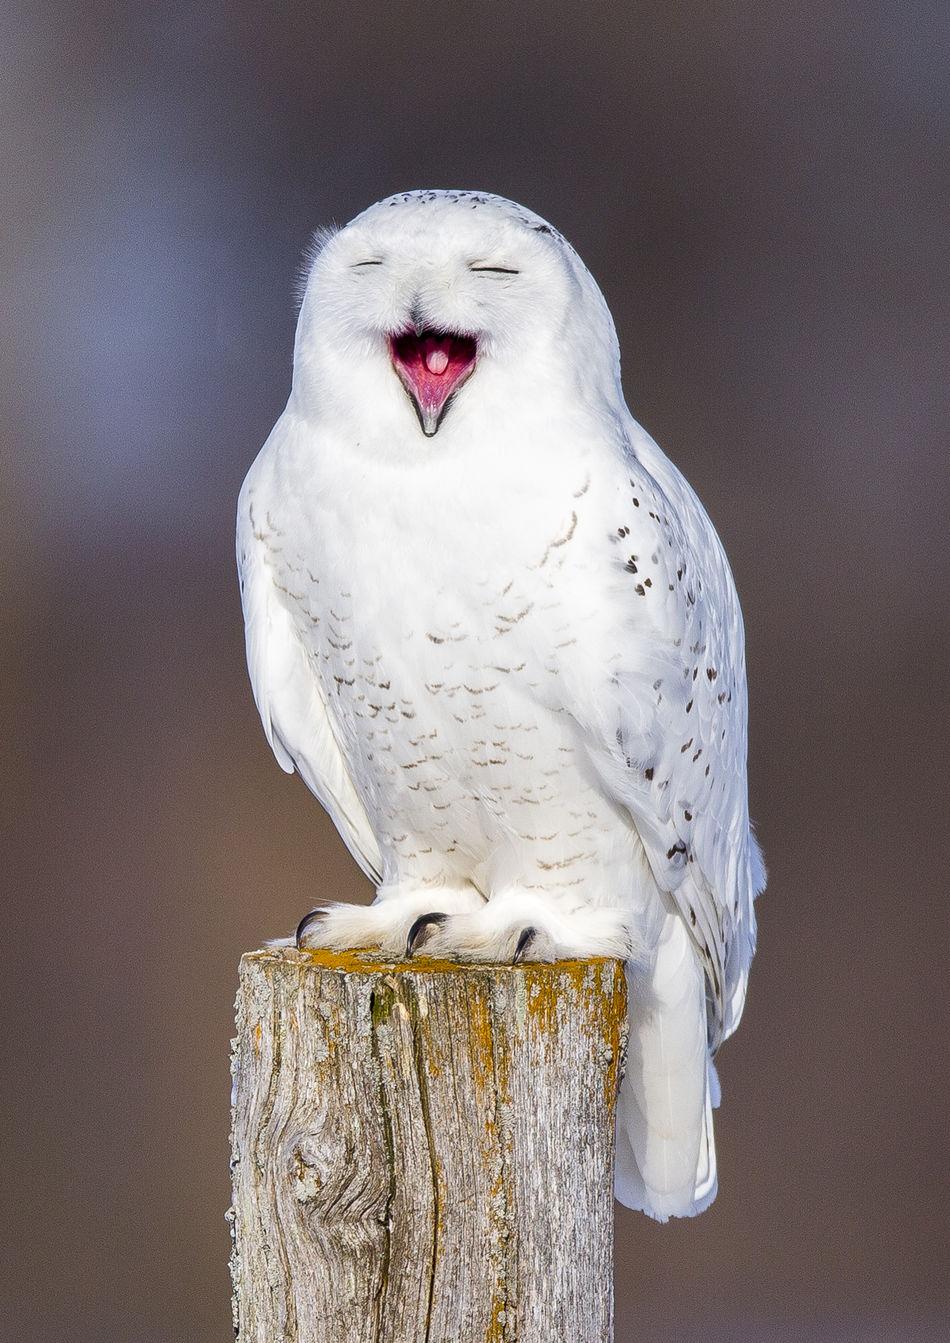 Snow owl posing Animal Themes Animal Wildlife Bird Close-up Day Fence Post Male No People One Animal Owl Snow Owl White Color